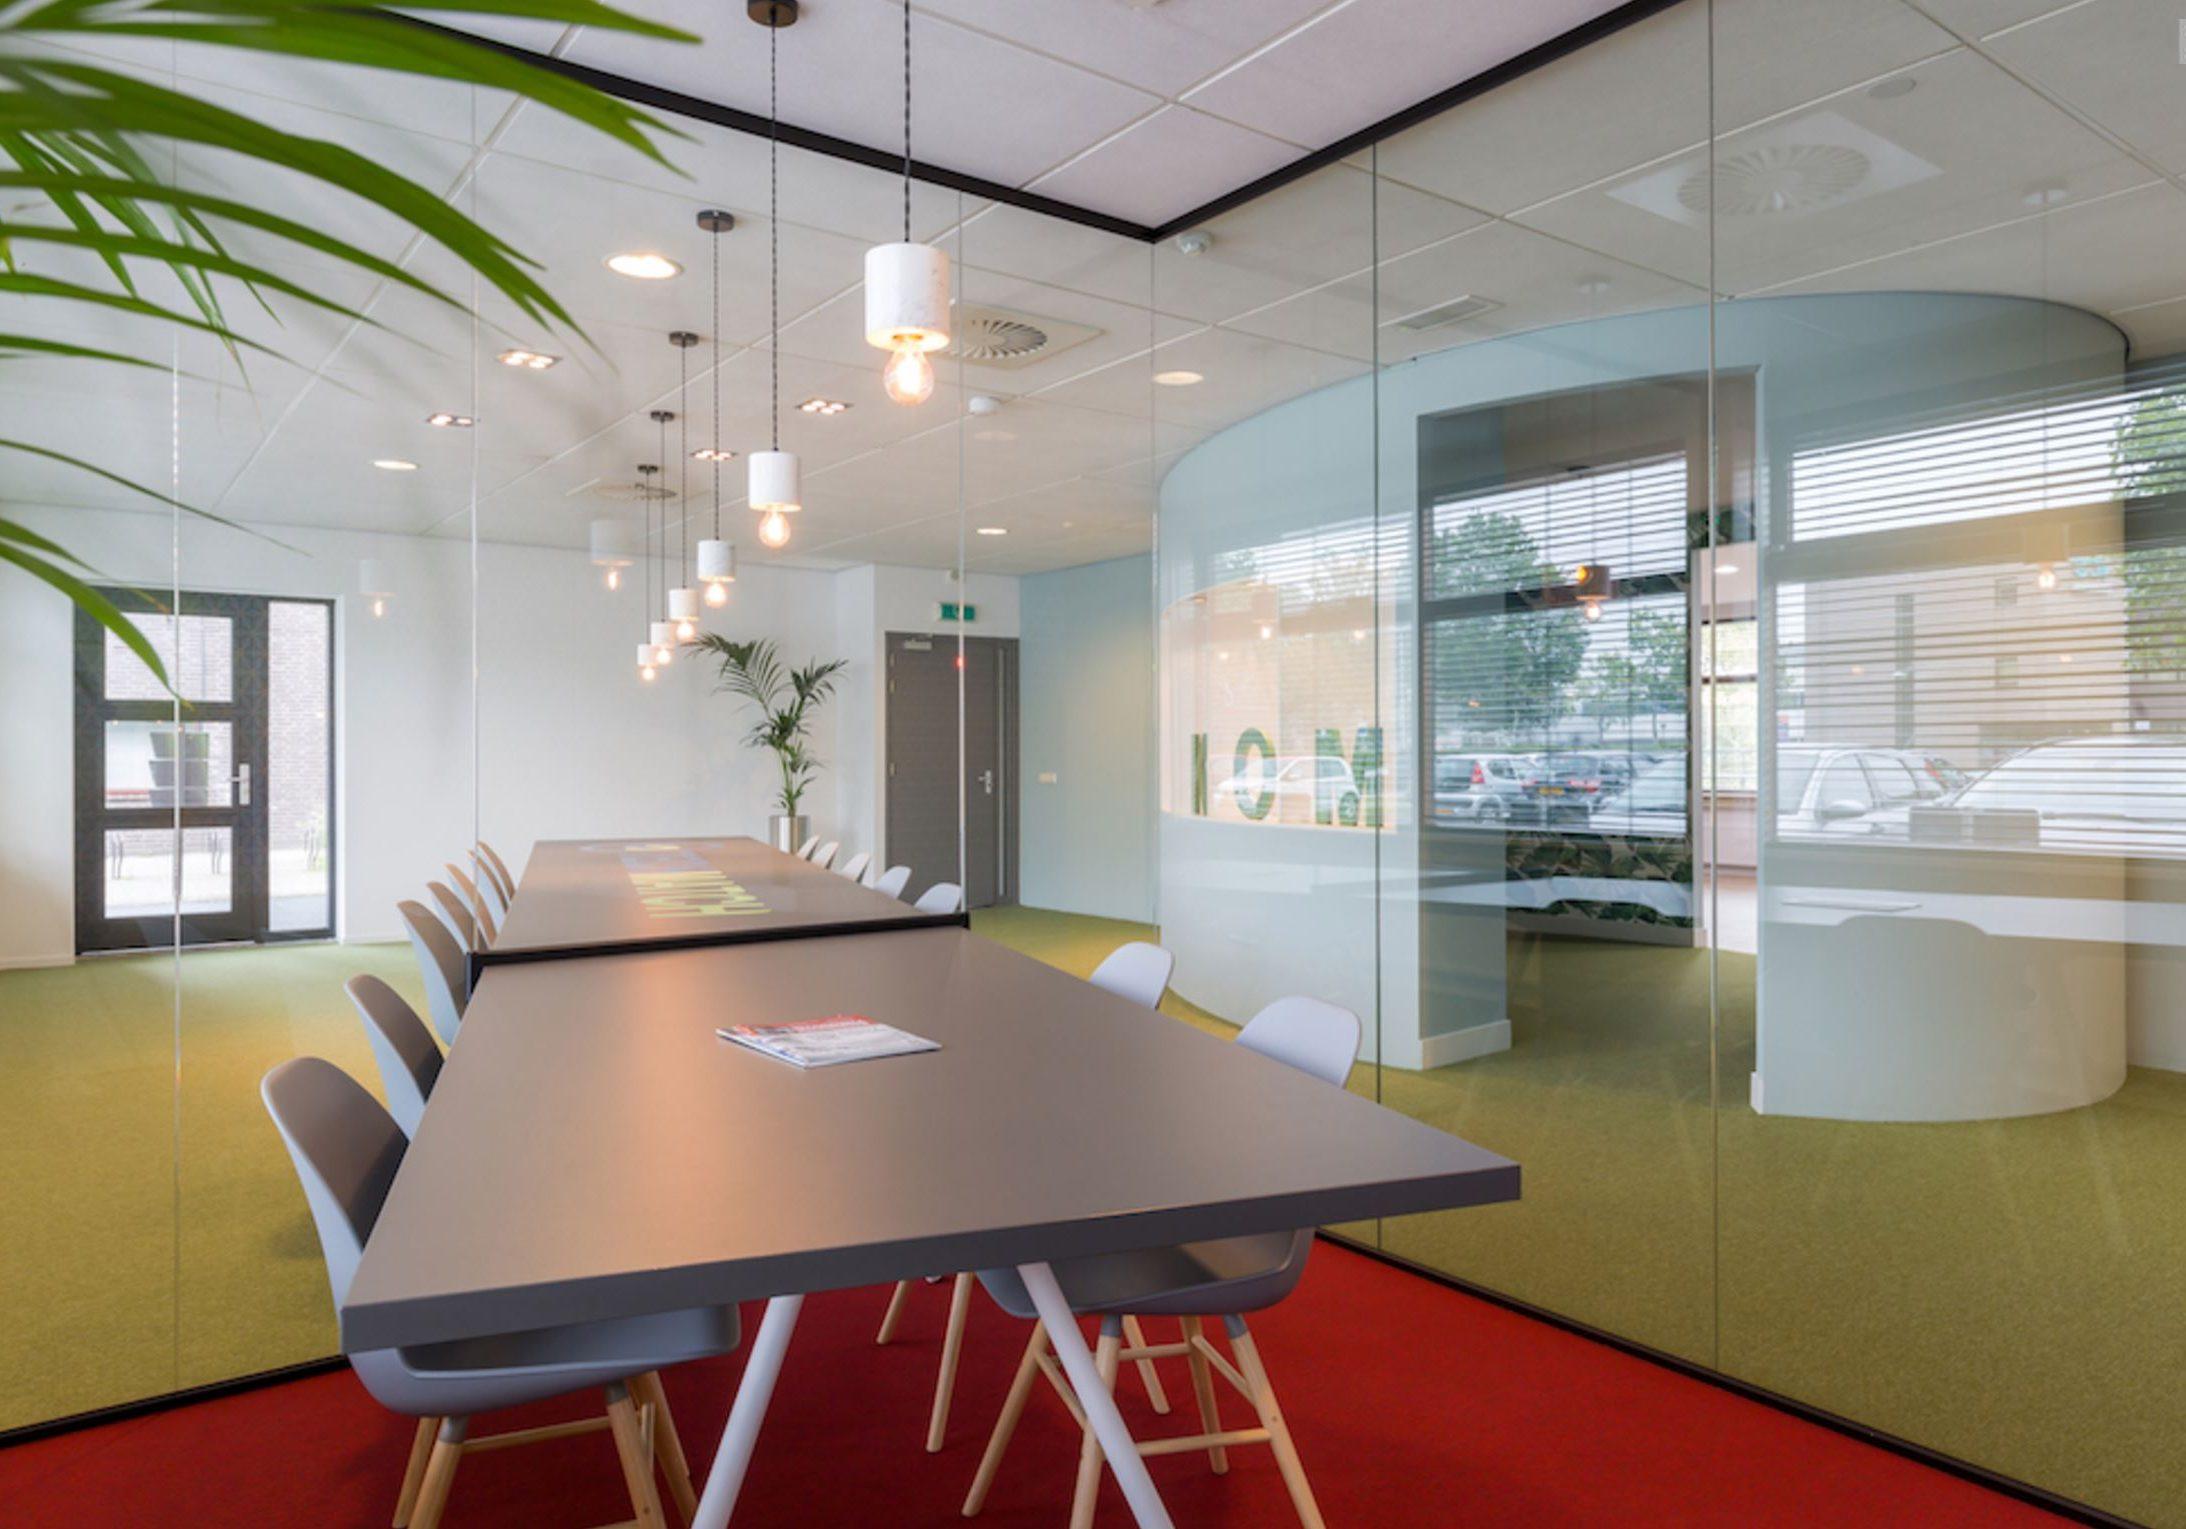 Interieur kantoor Techmatch Eindhoven